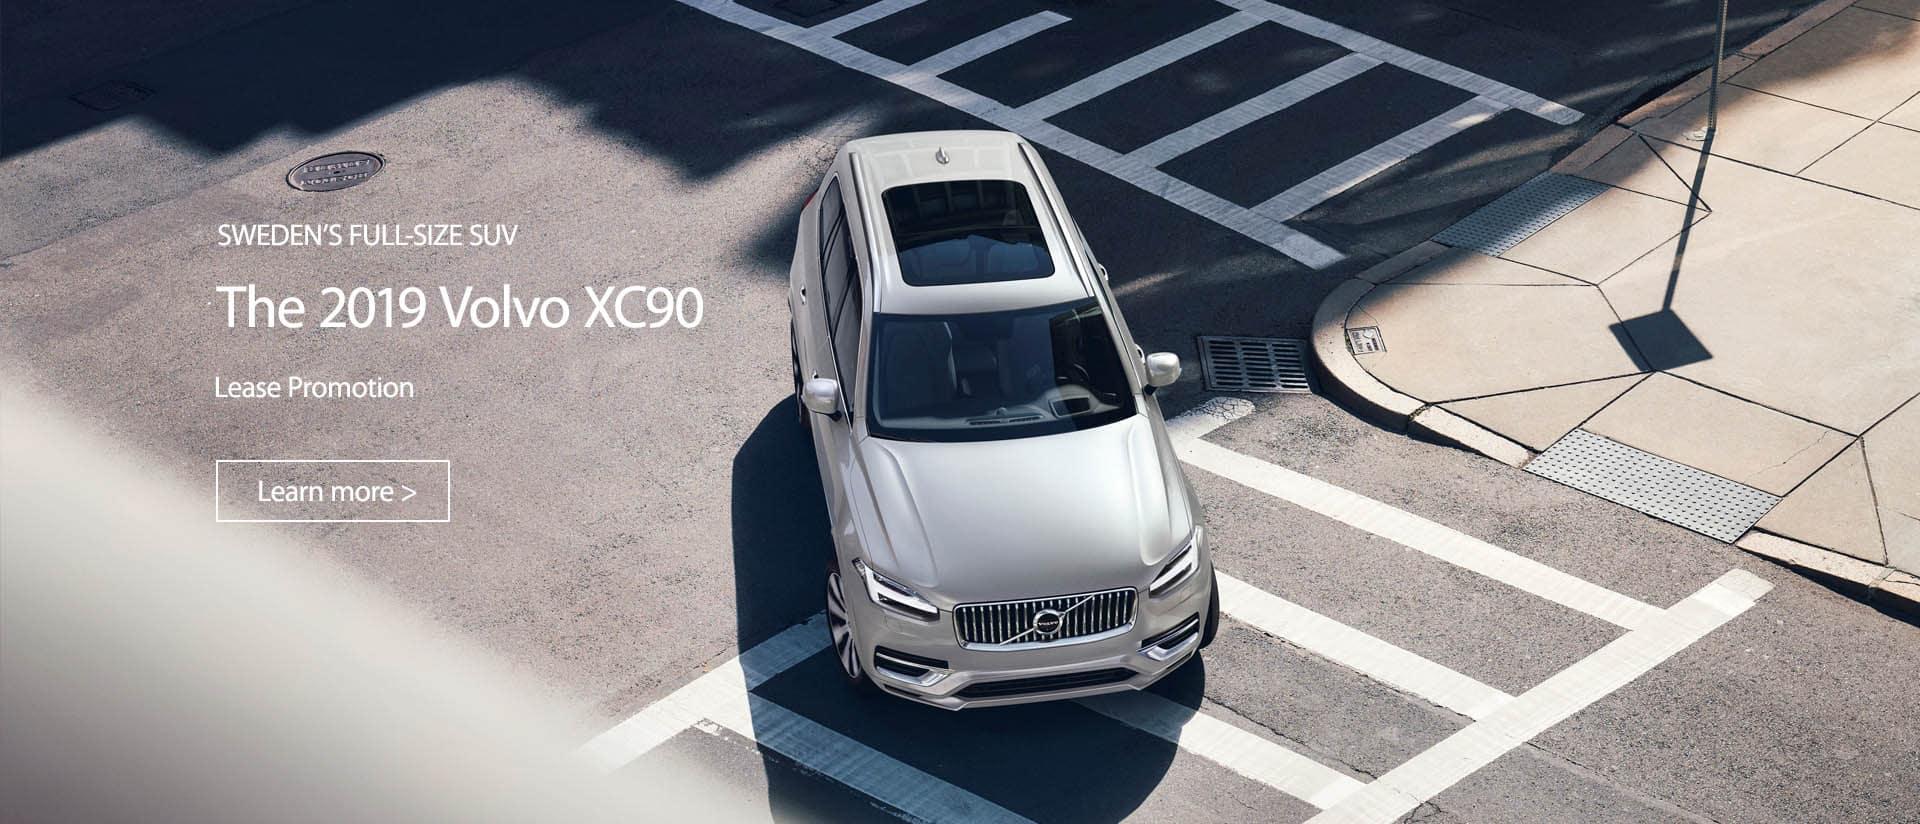 XC90 Lease Promotion